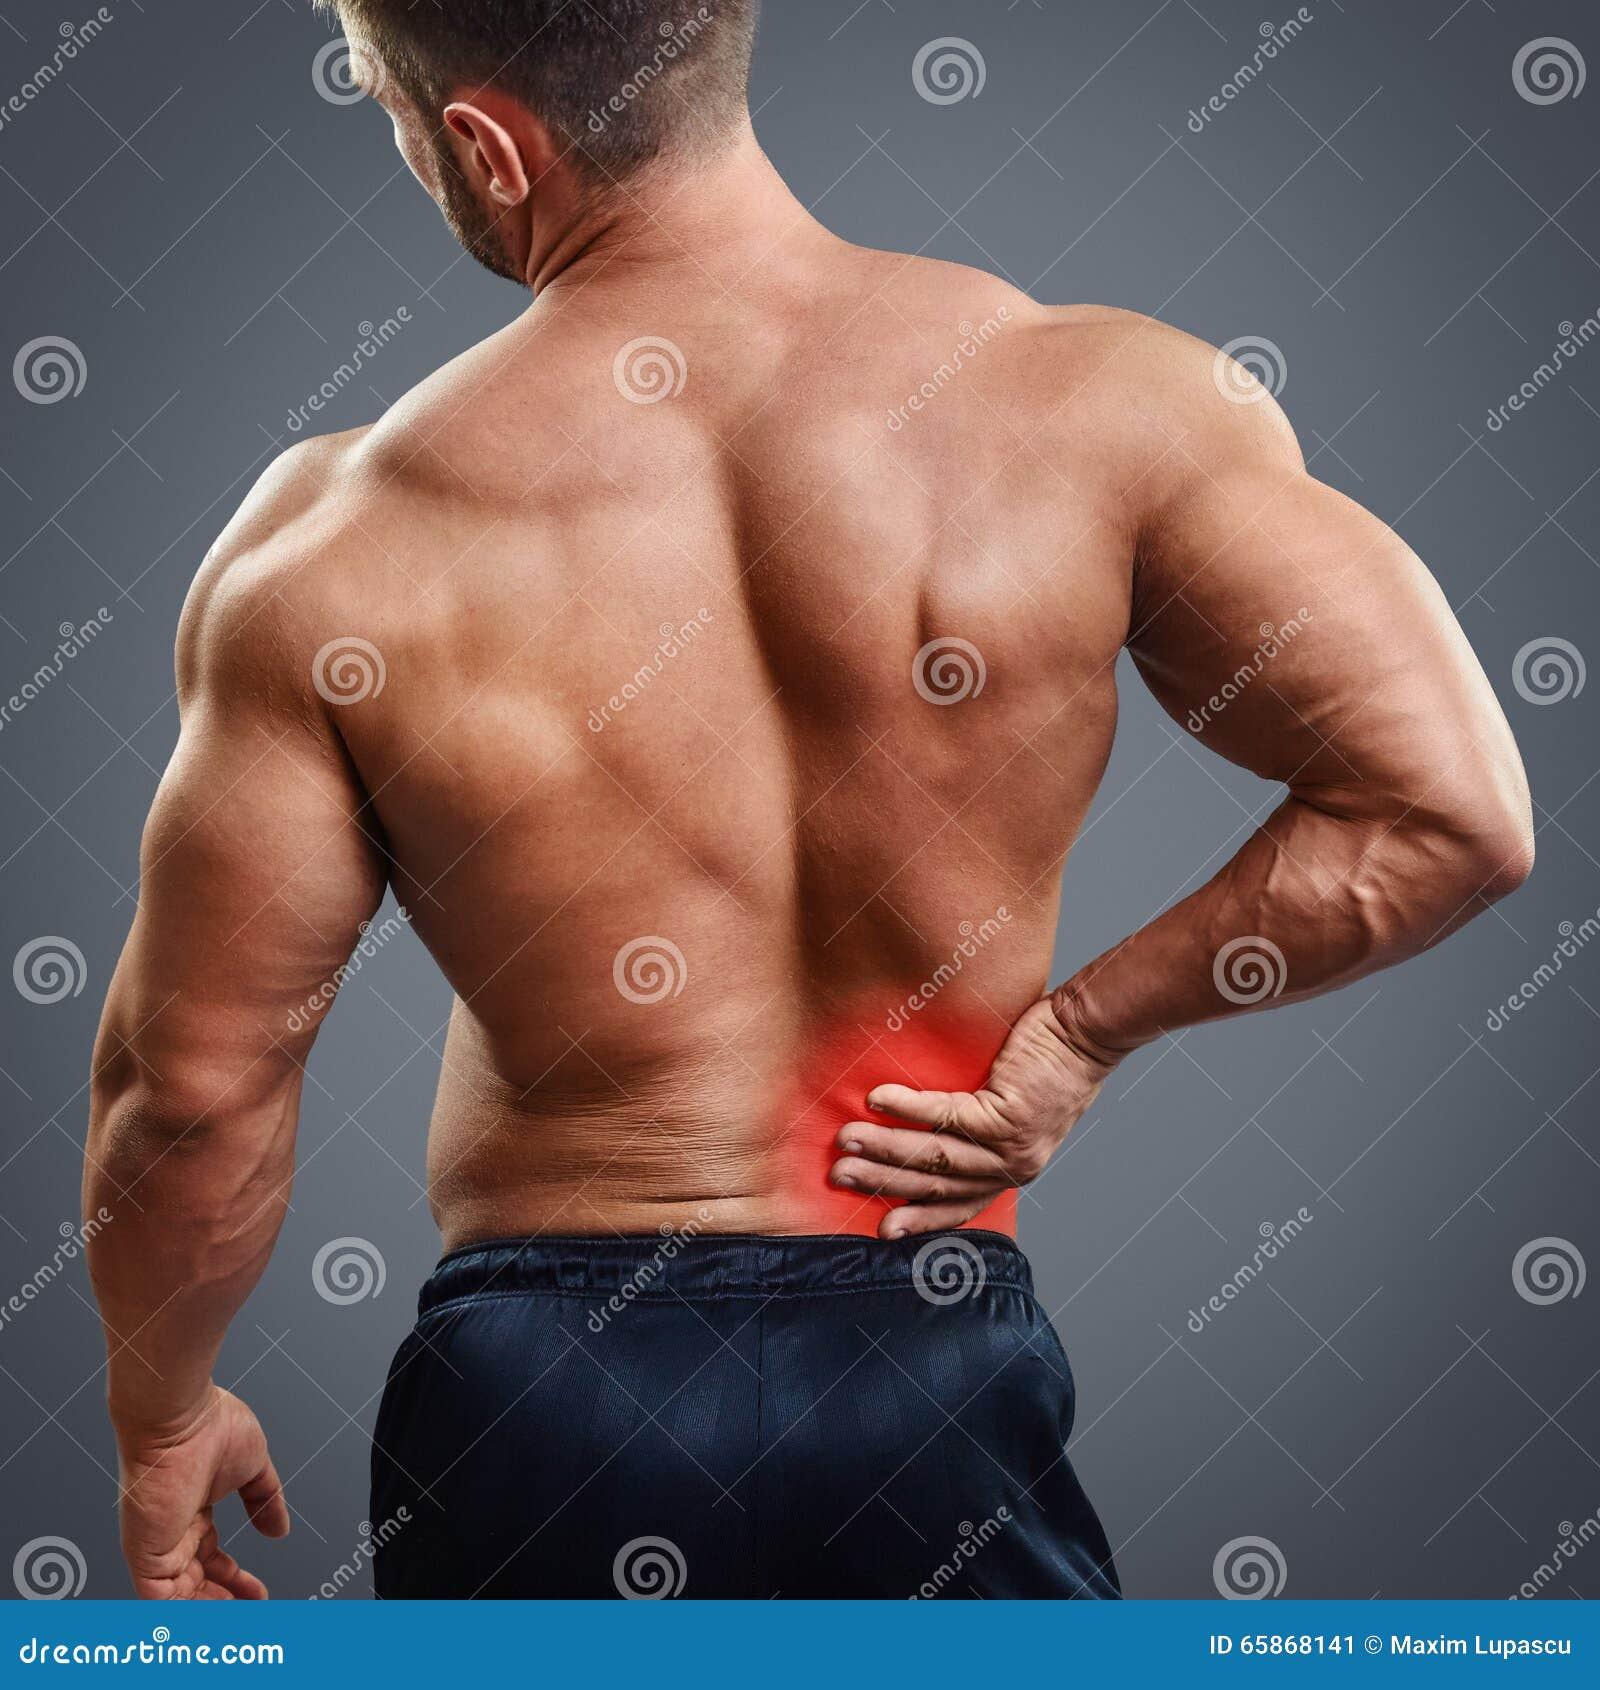 ahtletic muscle man back pain stock photo 65868141 megapixl